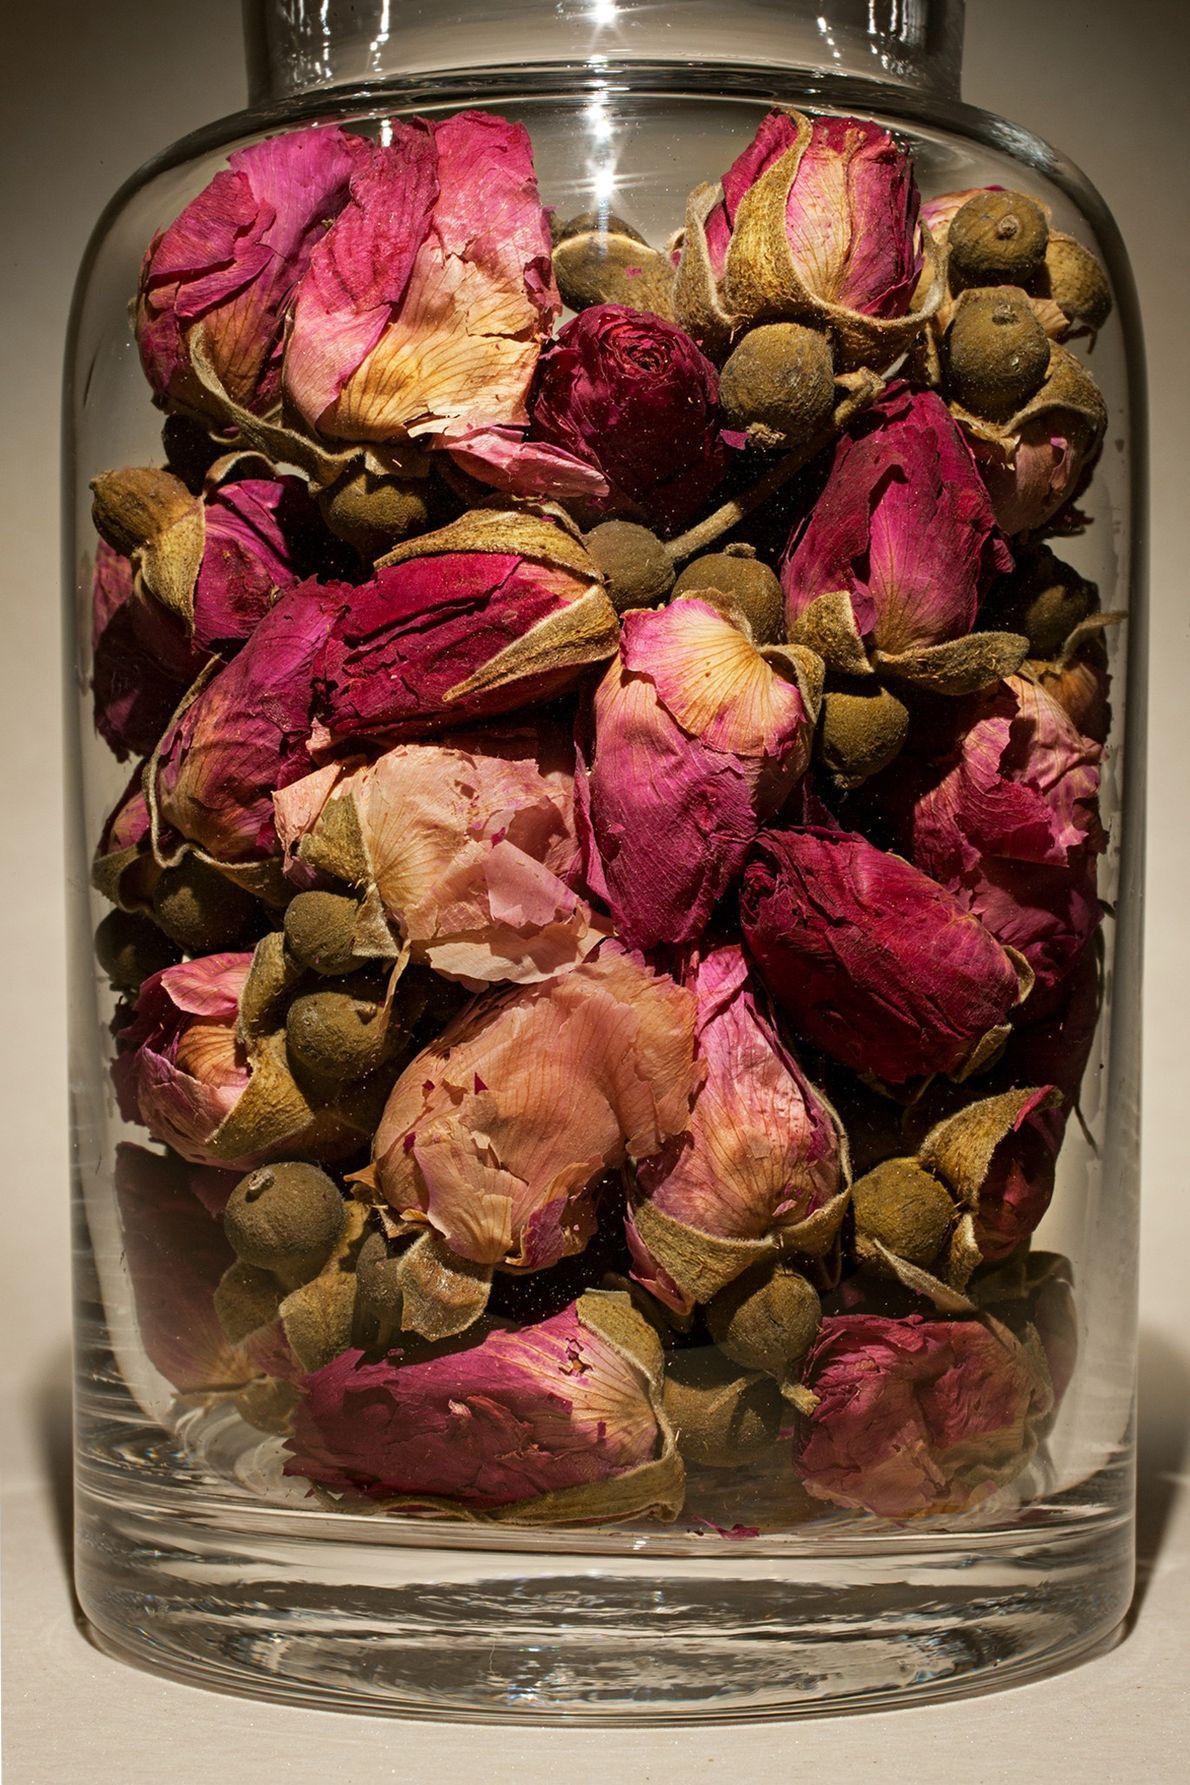 Nombre común: Capullo de rosa Latín: Rosa rugosa Chino: Mei gui hua Usos: Indigestión, distensión